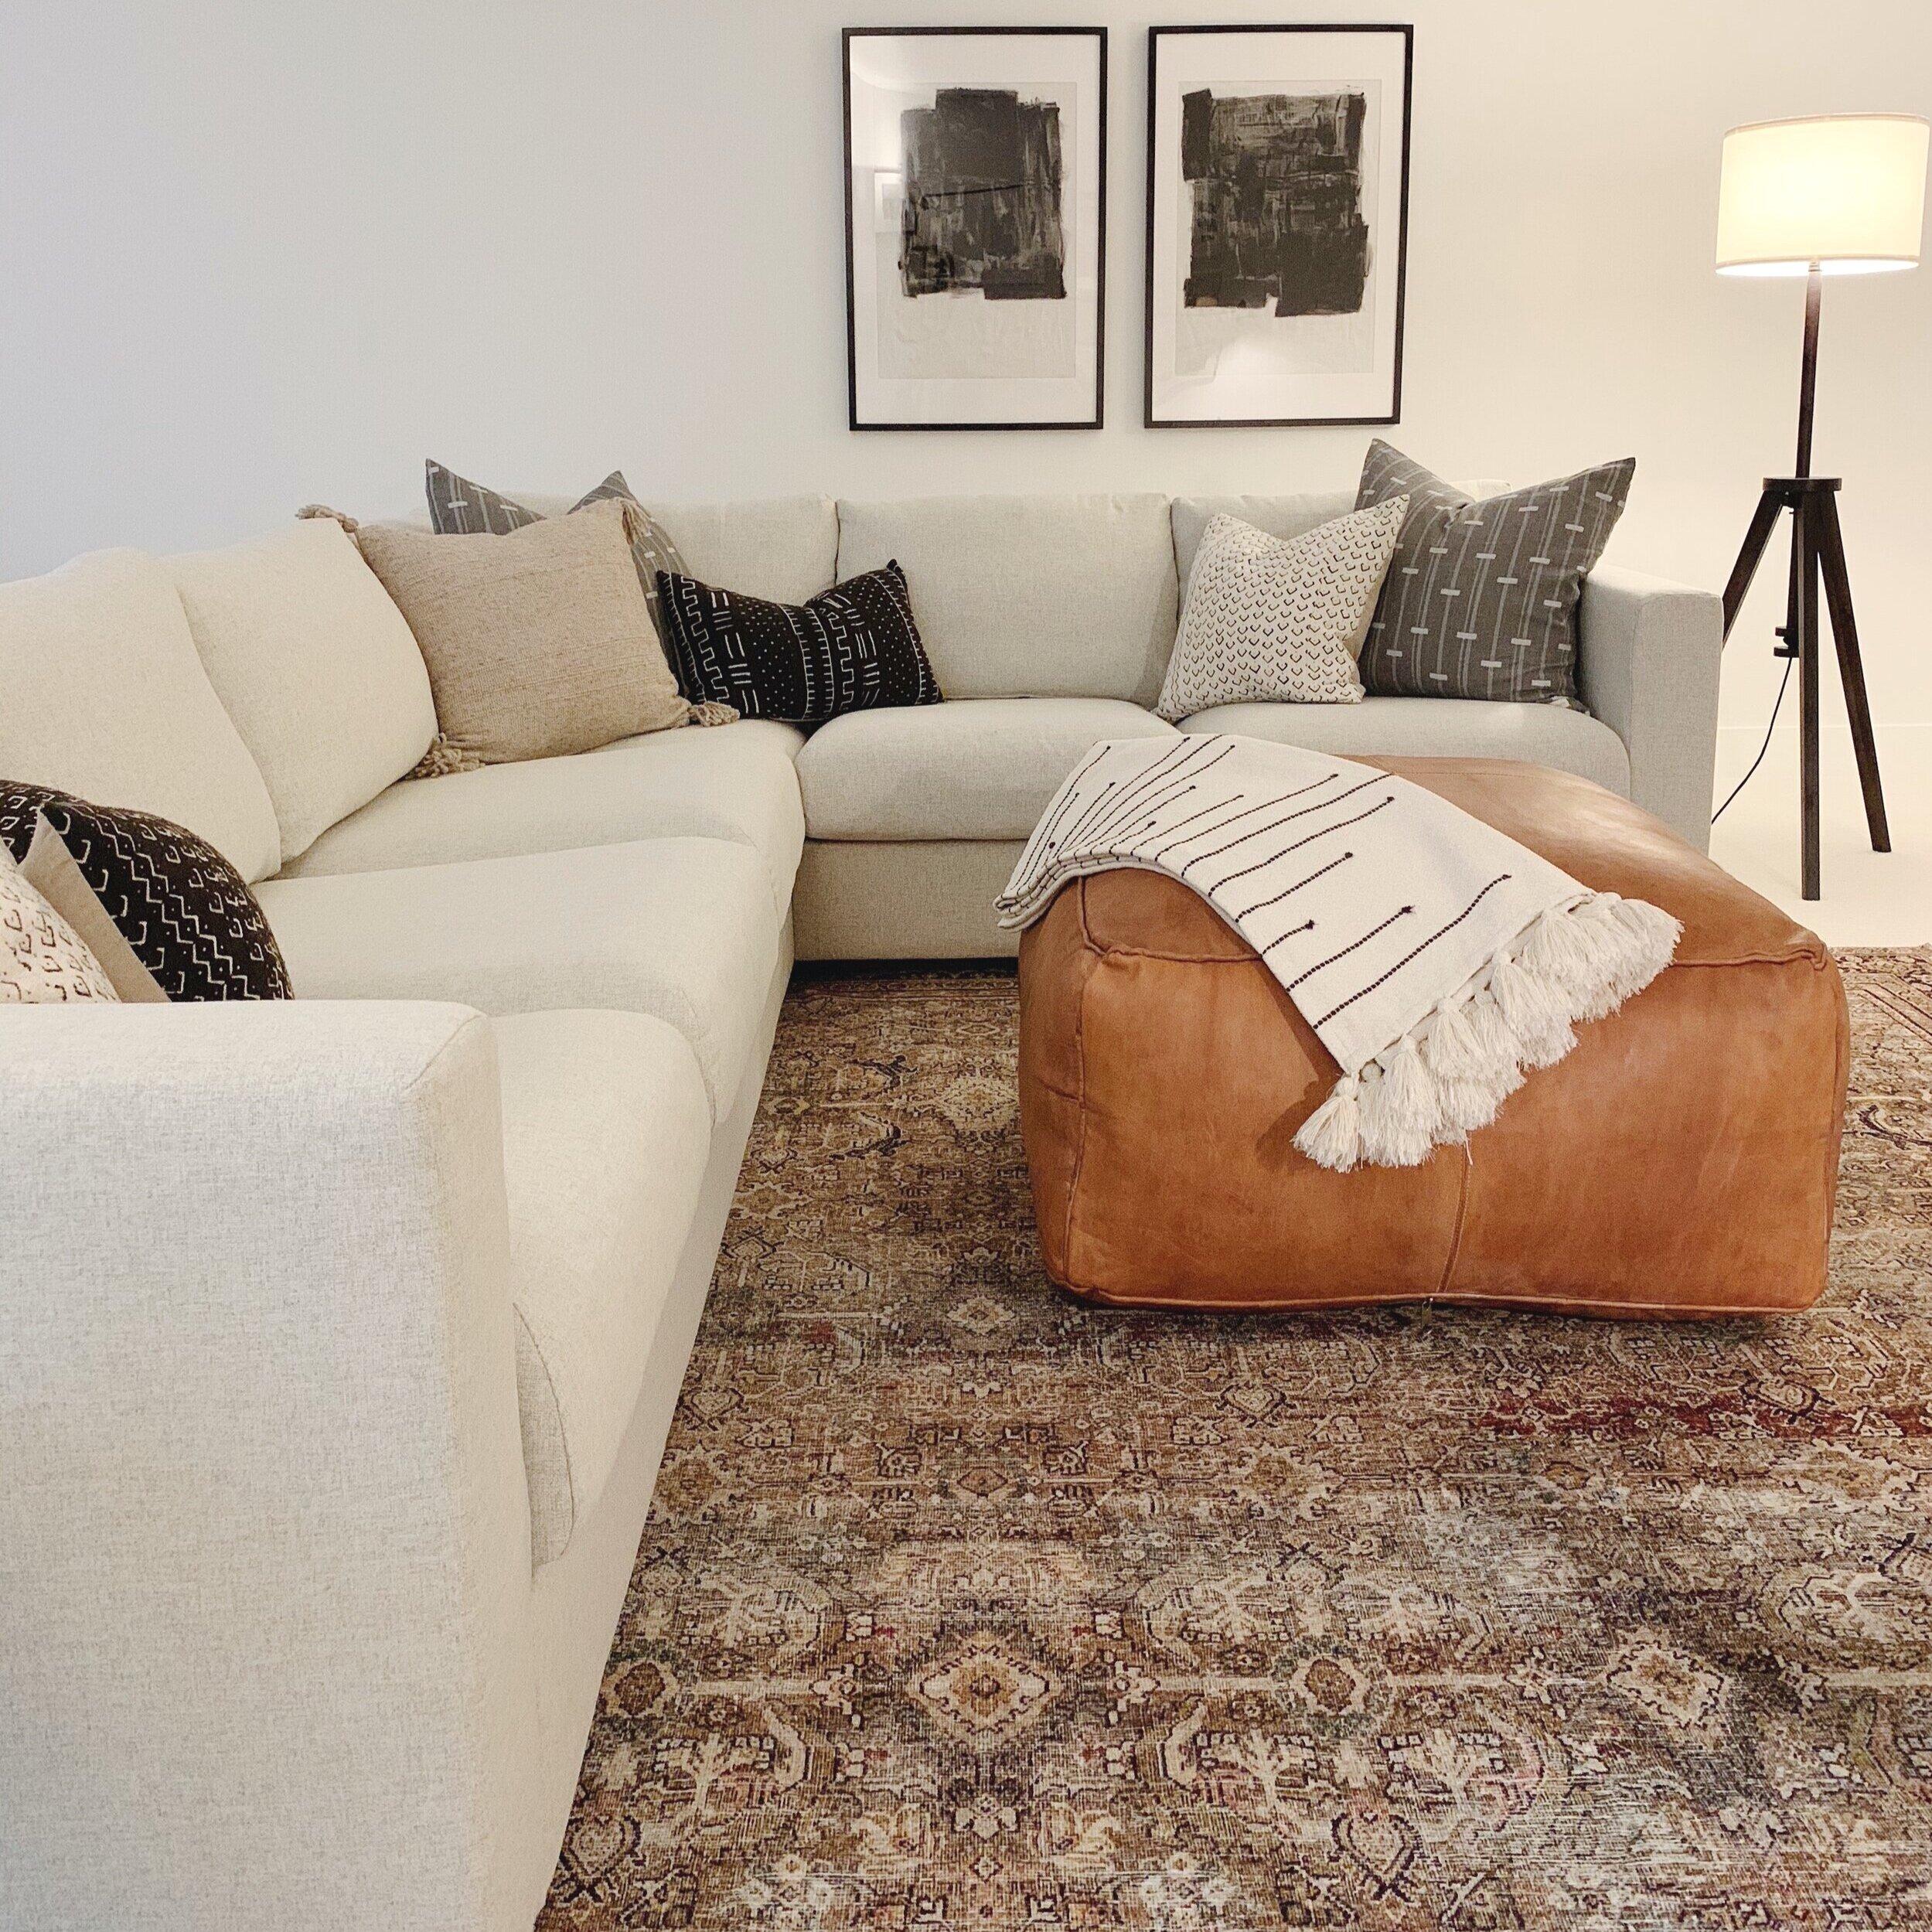 ikea vimle sectional sofa review my